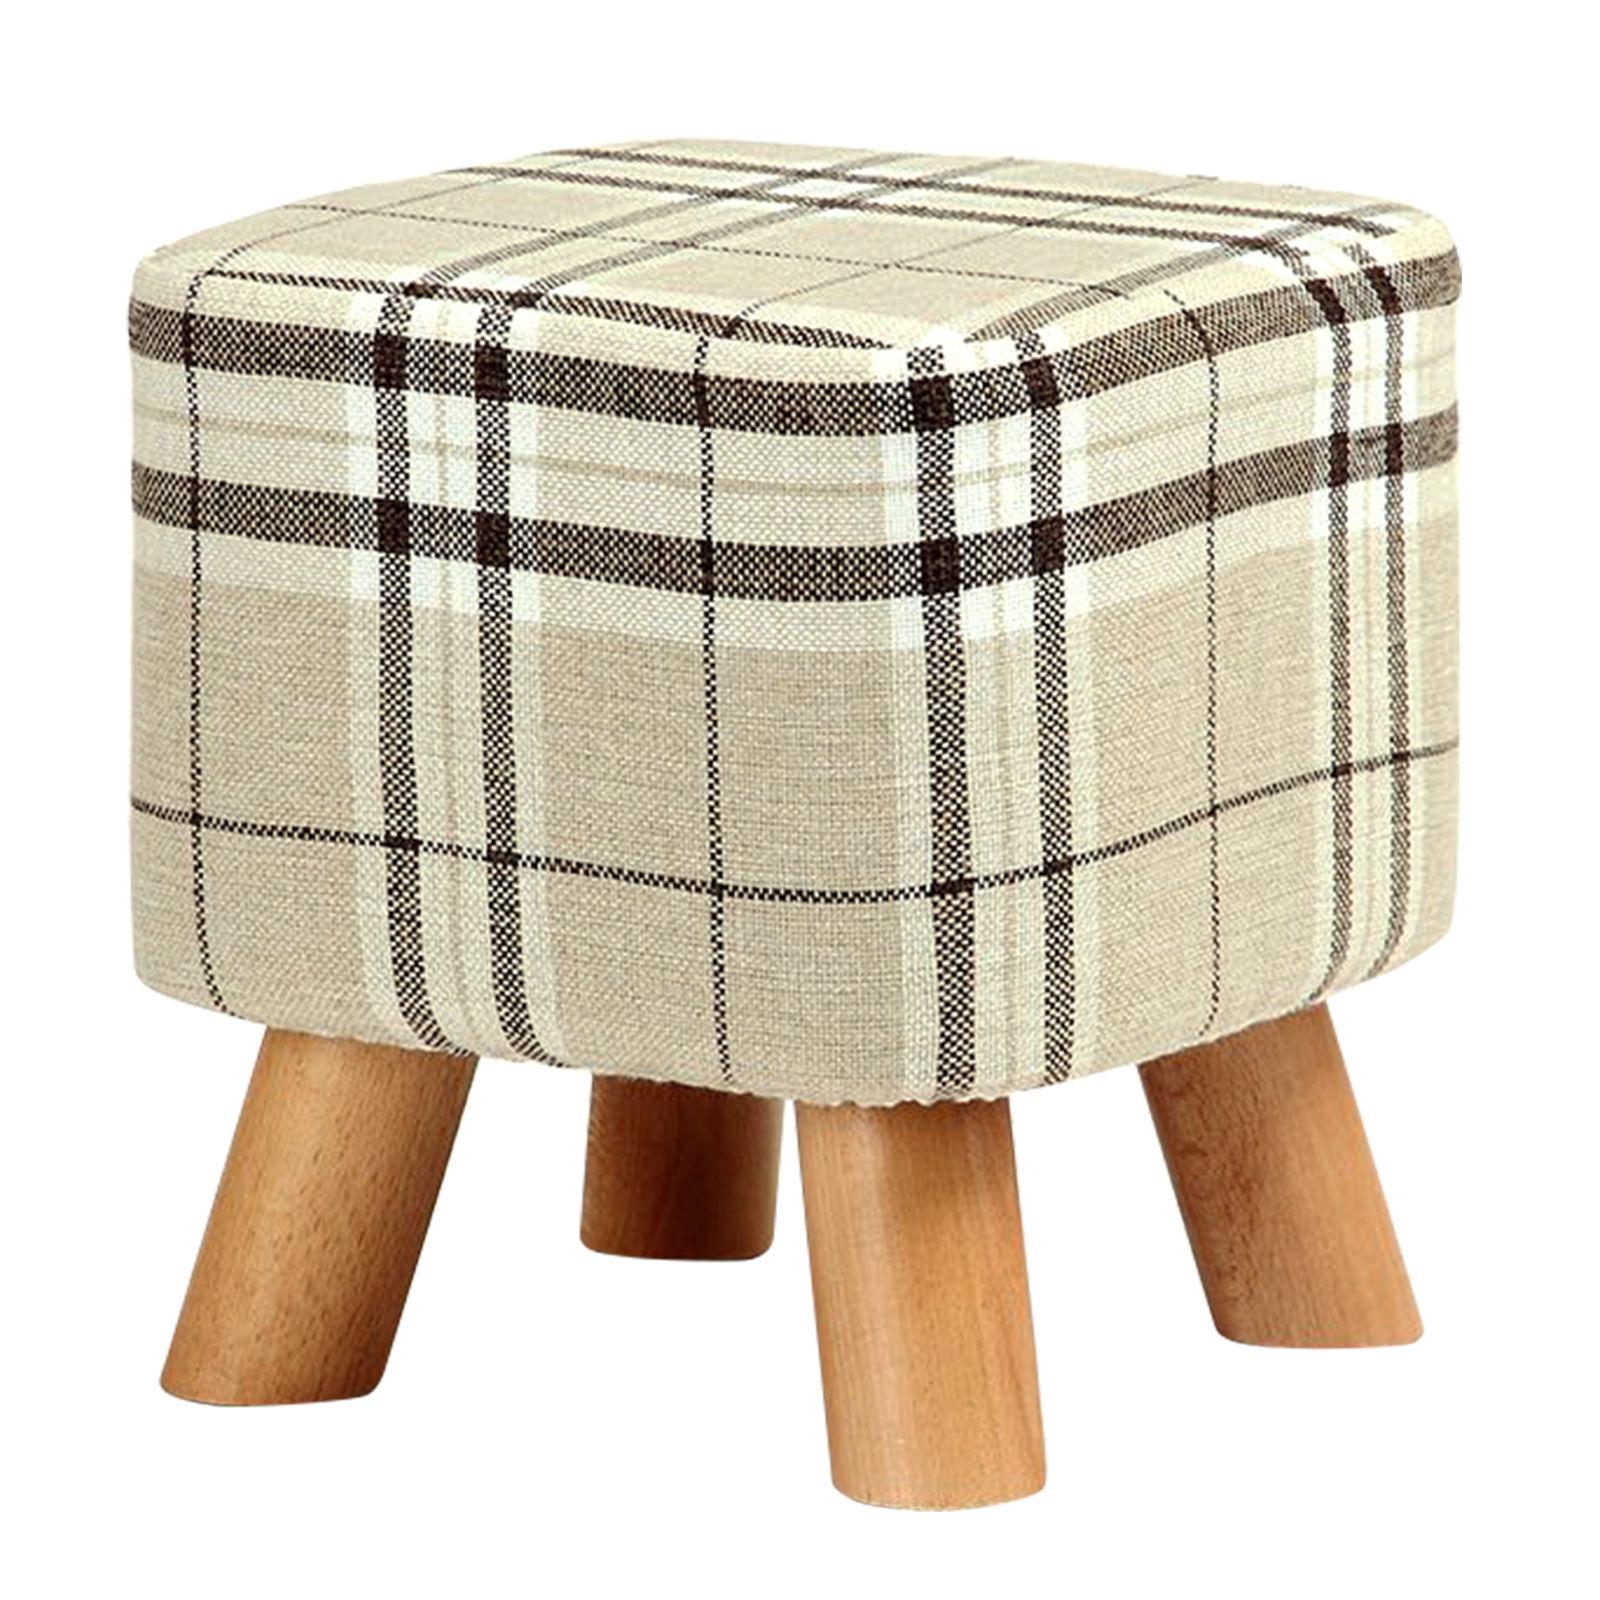 Best Modern Luxury Upholstered Footstool Pouffe Stool + Wooden Leg Pattern:Square Fabric:Big Checkered(4 Legs)Best Modern Luxury Upholstered Footstool Pouffe Stool + Wooden Leg Pattern:Square Fabric:Big Checkered(4 Legs)